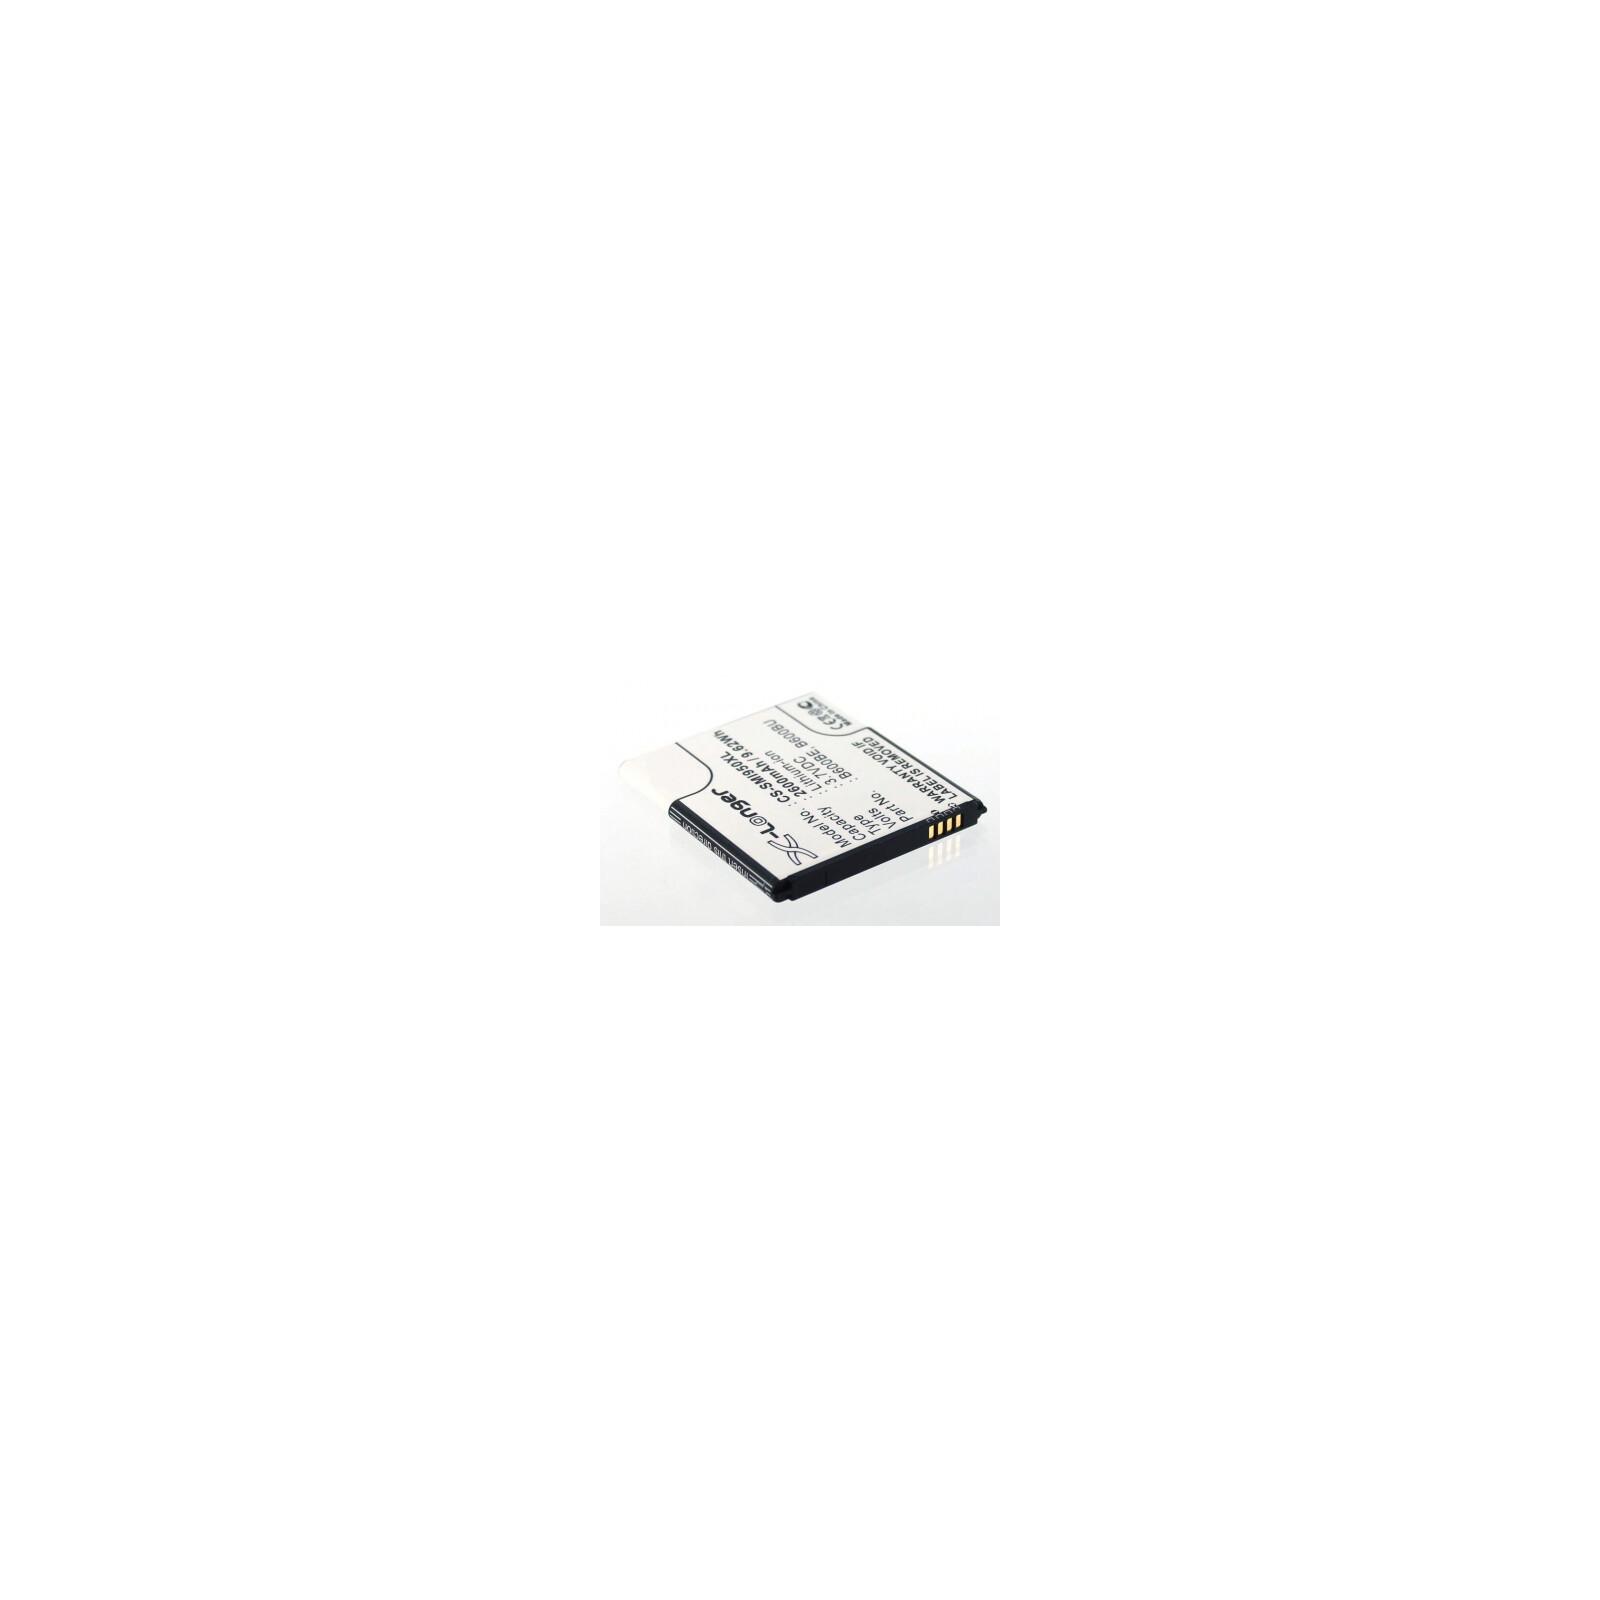 AGI Akku Samsung GT-I9500 2.600mAh